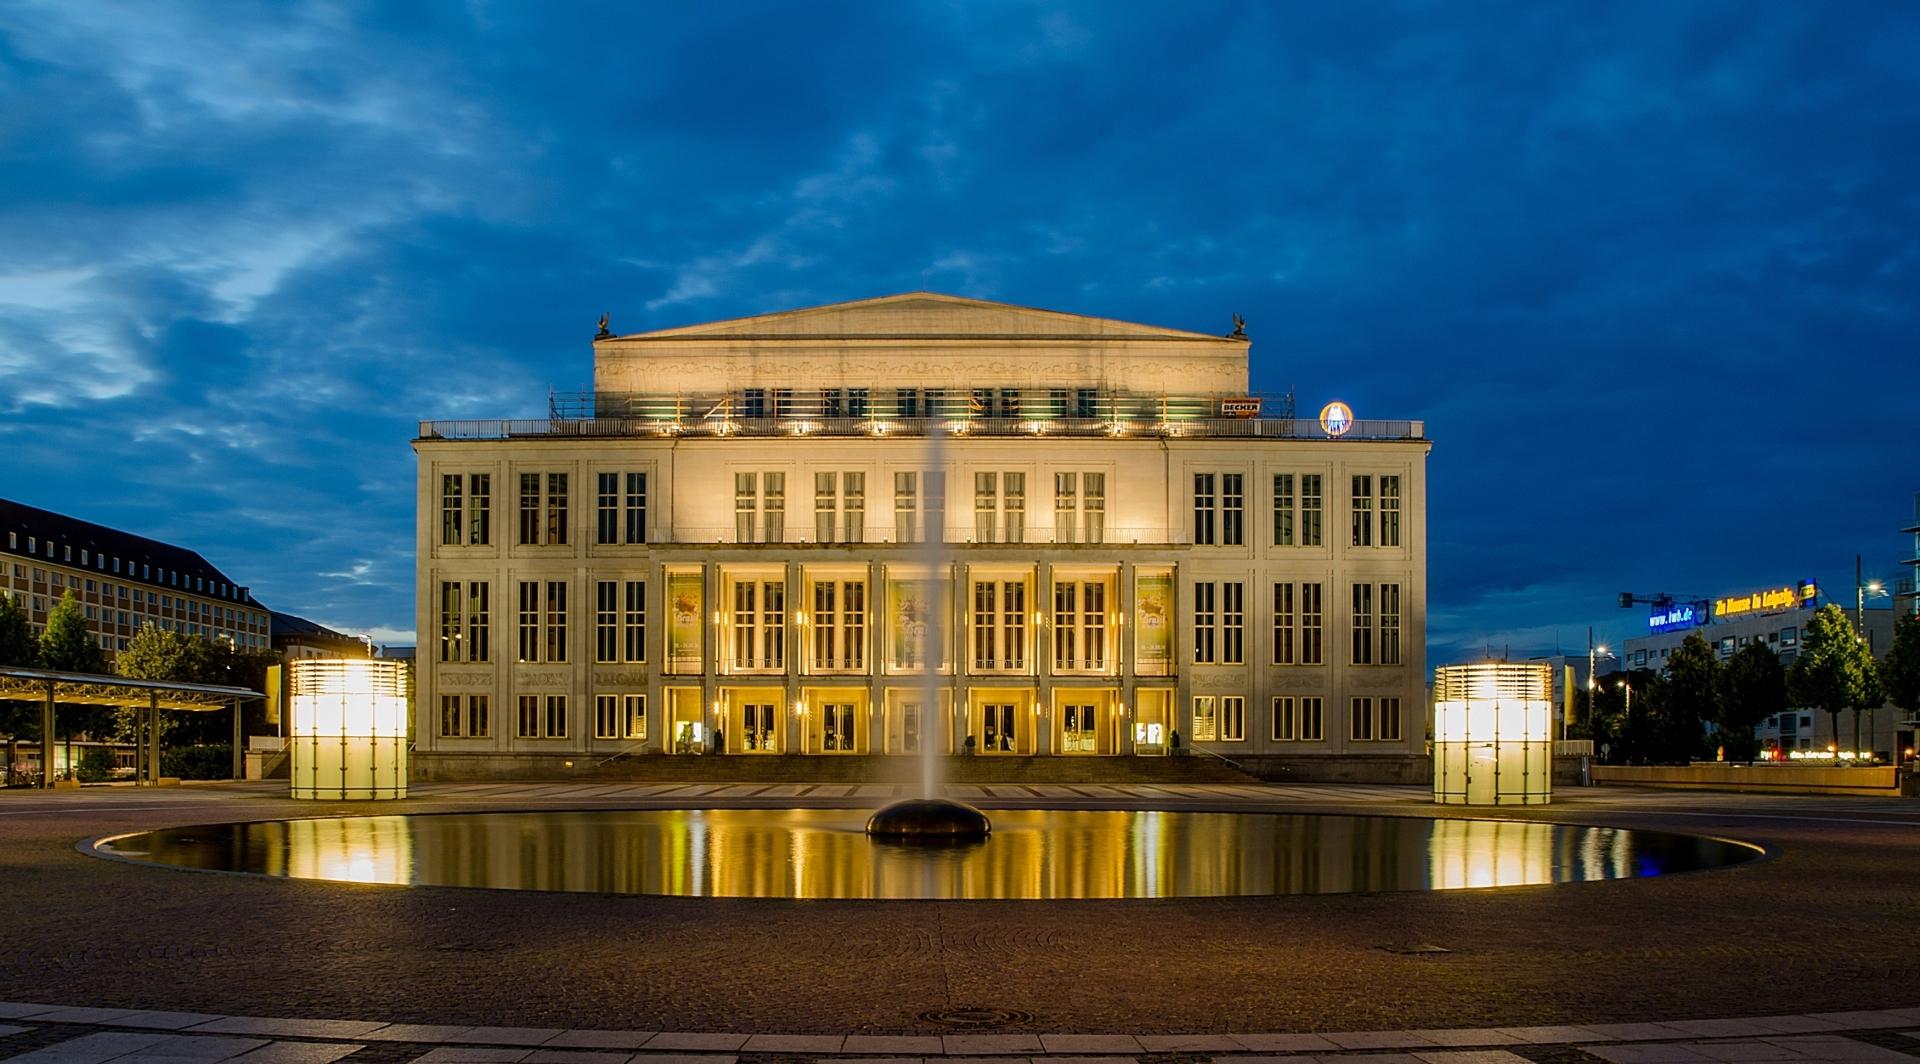 The Leipzig Opera